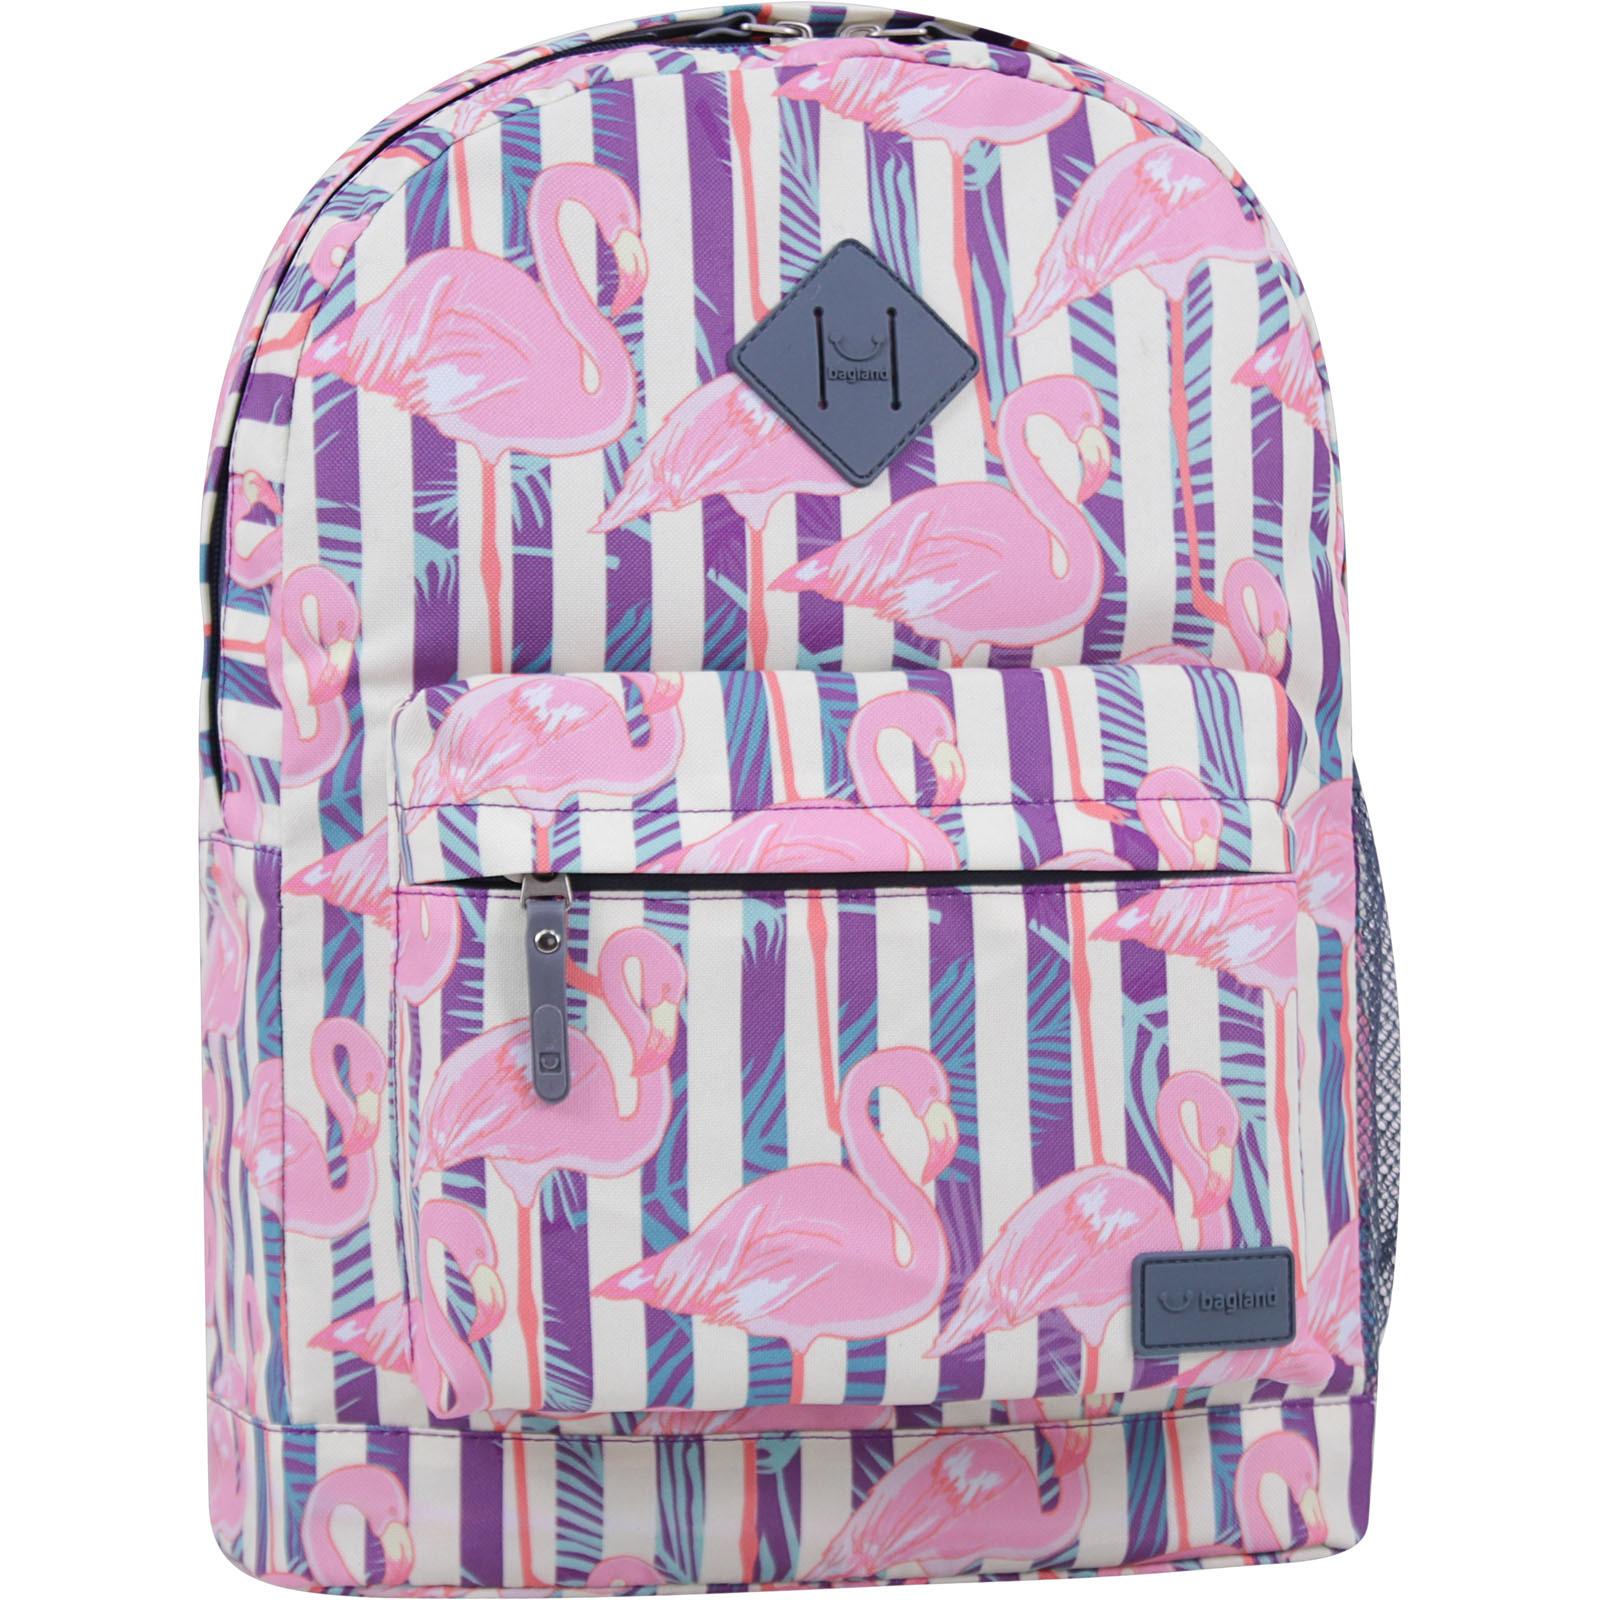 Городские рюкзаки Рюкзак Bagland Молодежный 17 л. сублімація 823 (00533664) IMG_3292_суб823_-1600.jpg